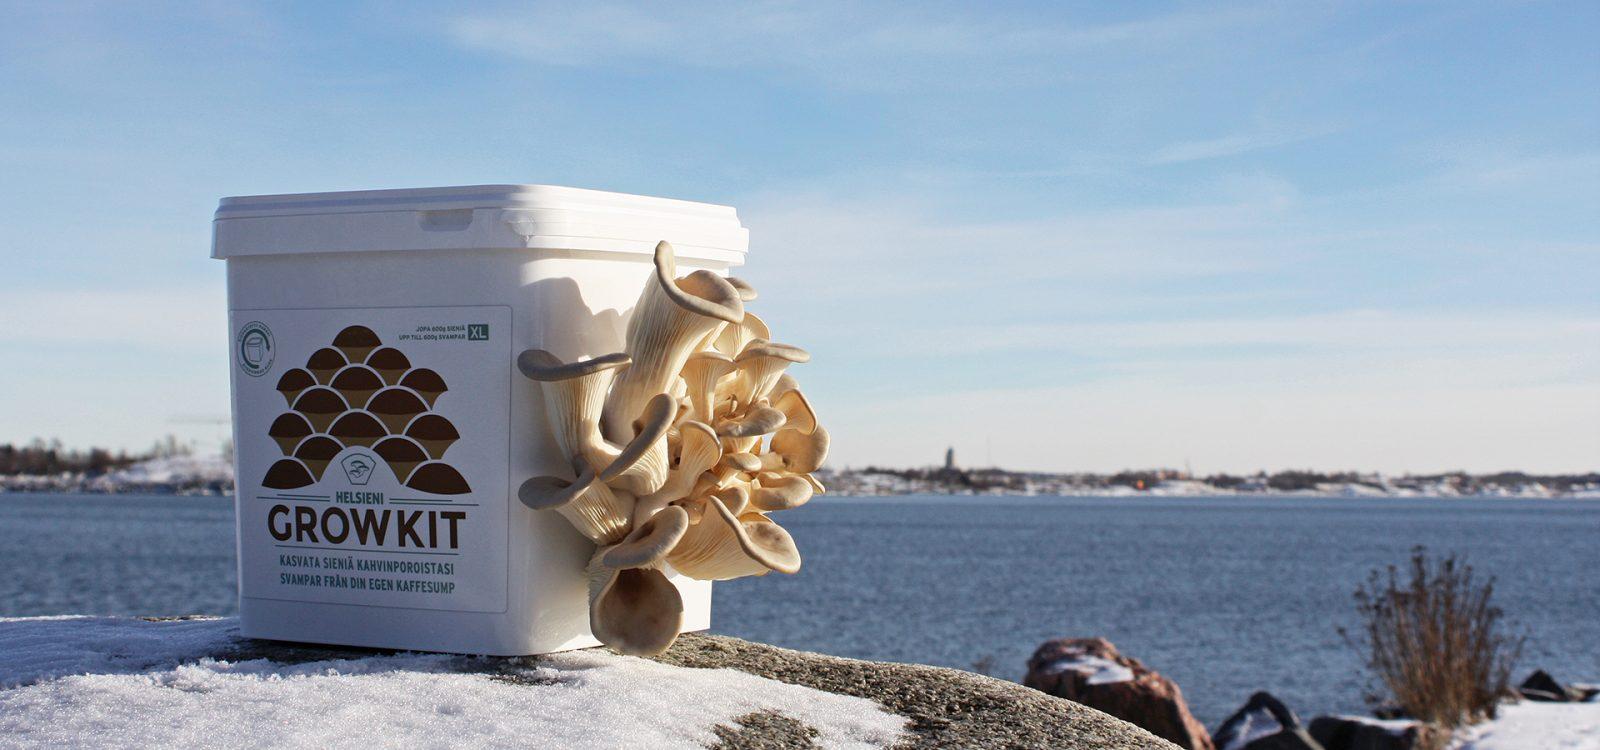 Helsieni – Mushrooms from Helsinki